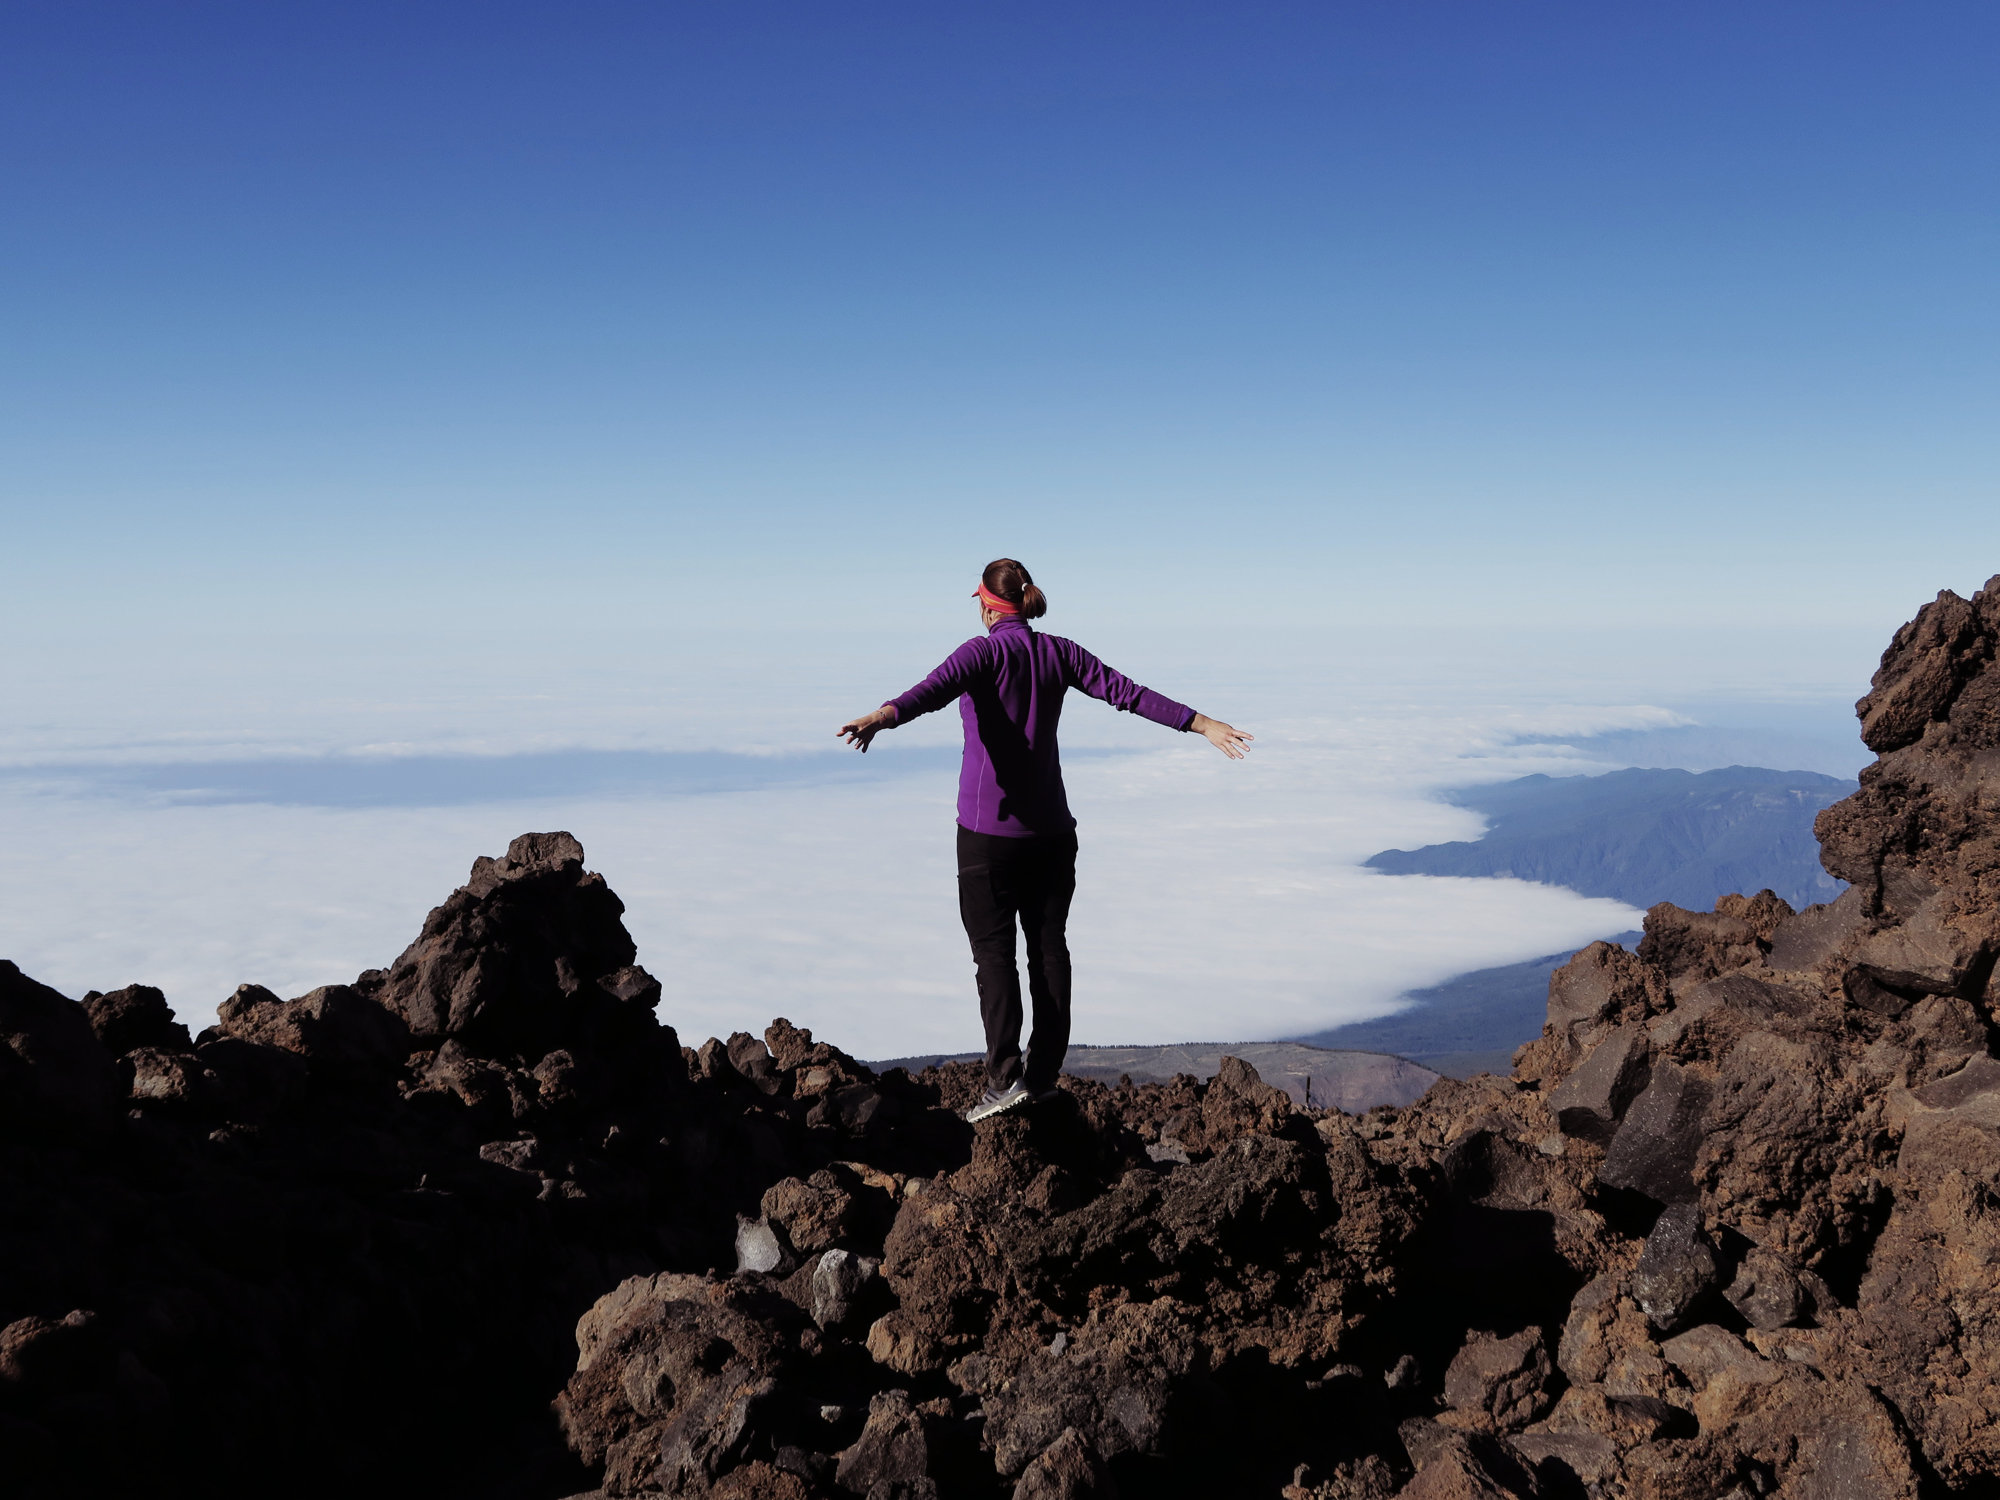 Über dem Wolkenmeer am Teide Nationalpark